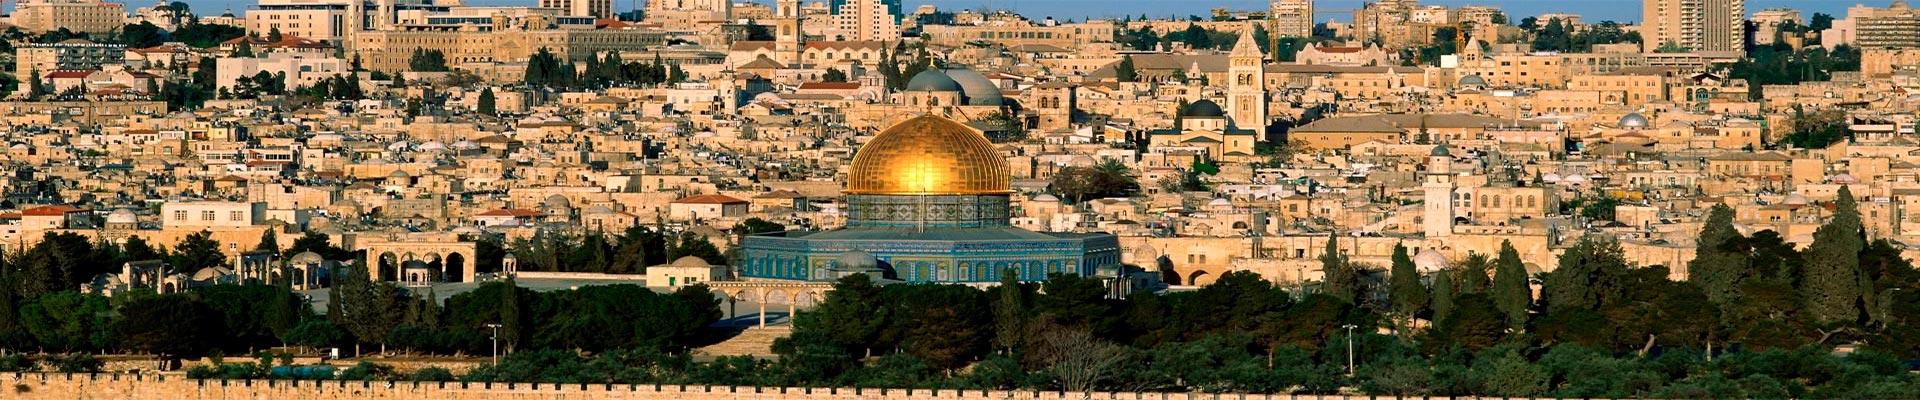 Israel e Jordânia